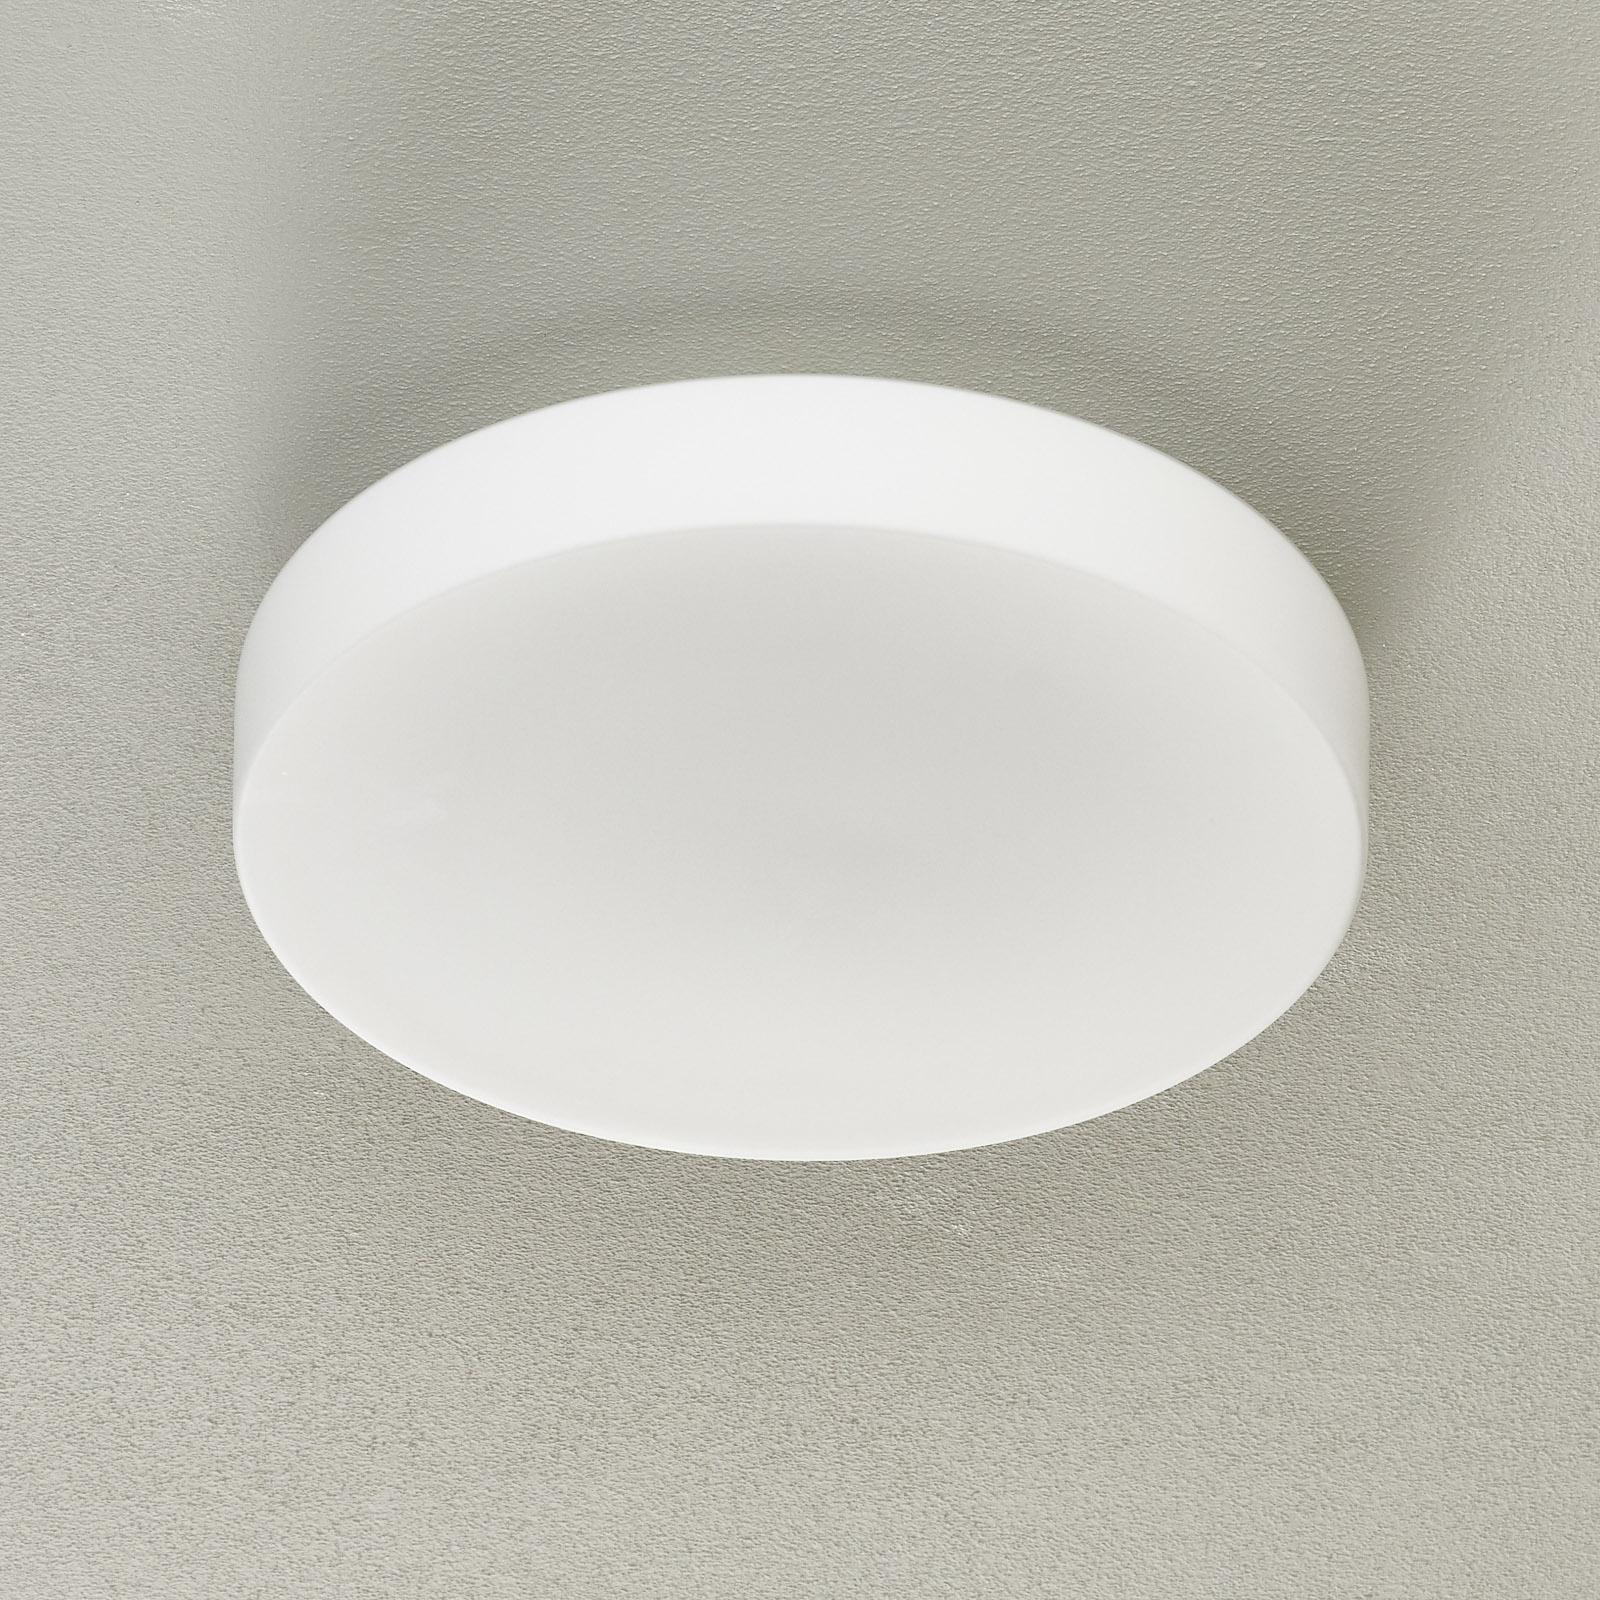 BEGA 34288 lampa sufitowa LED biała DALI Ø 39 cm